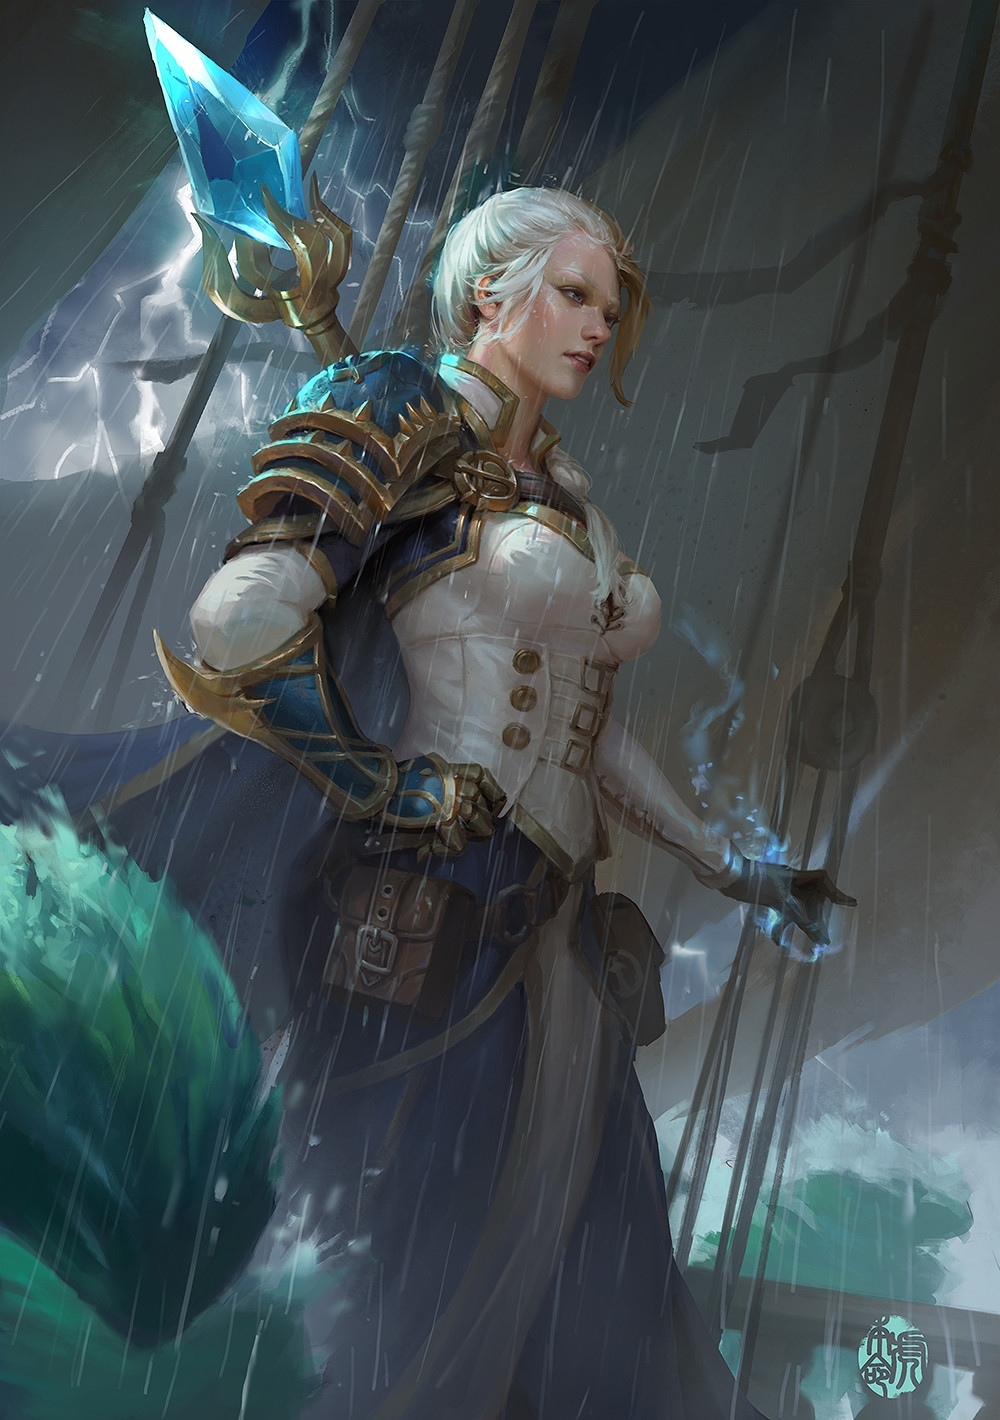 SEZs2raYGj8.jpg - World of Warcraft